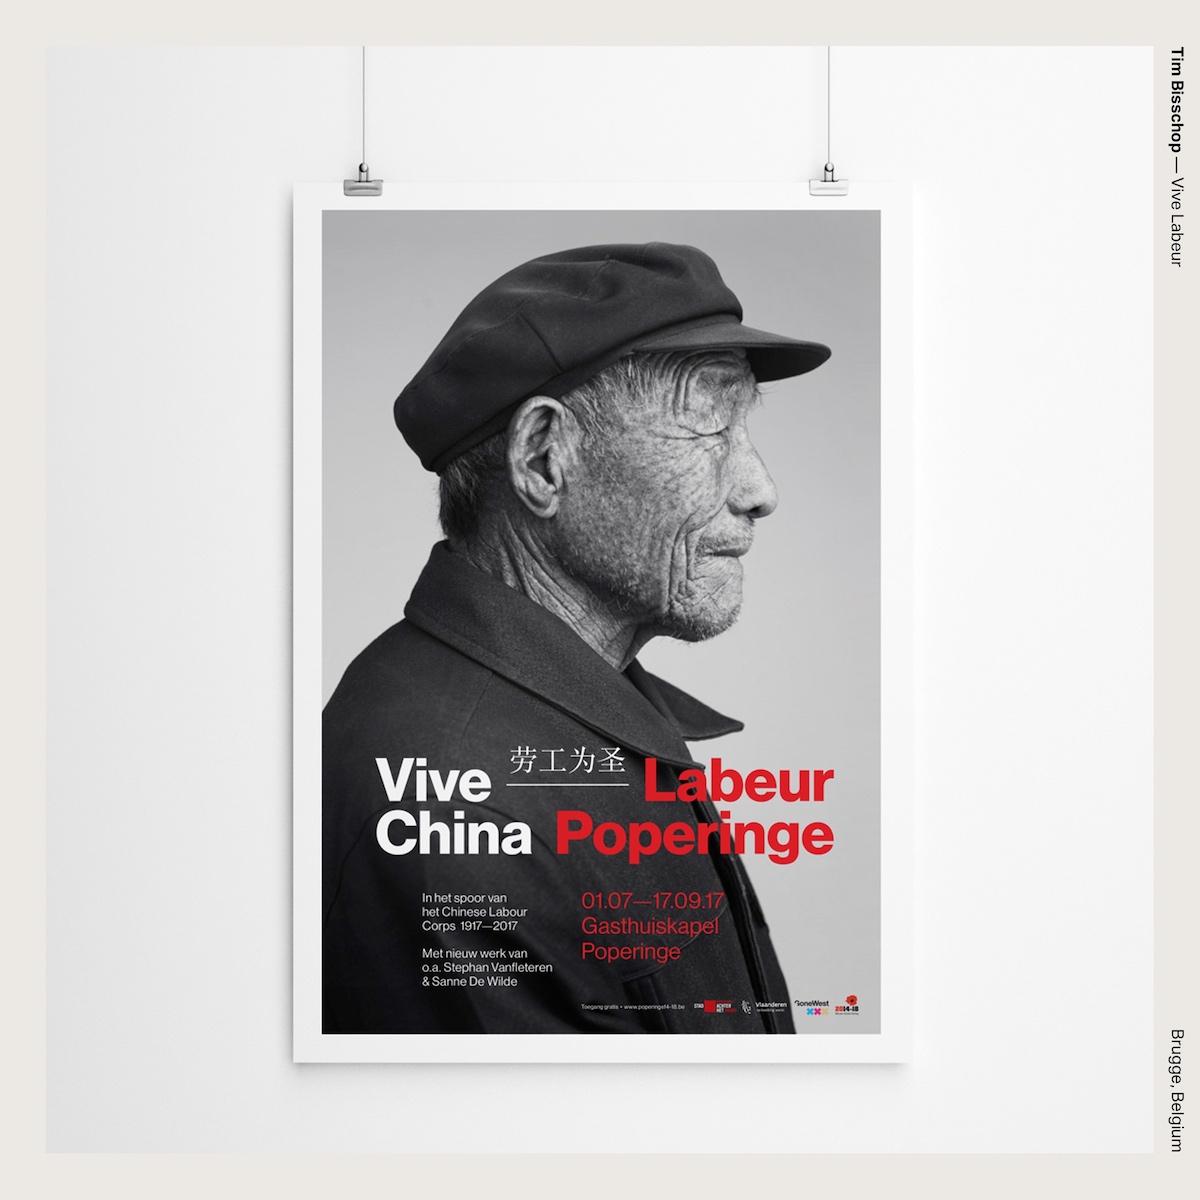 Tim Bisschop — Vive Labeur